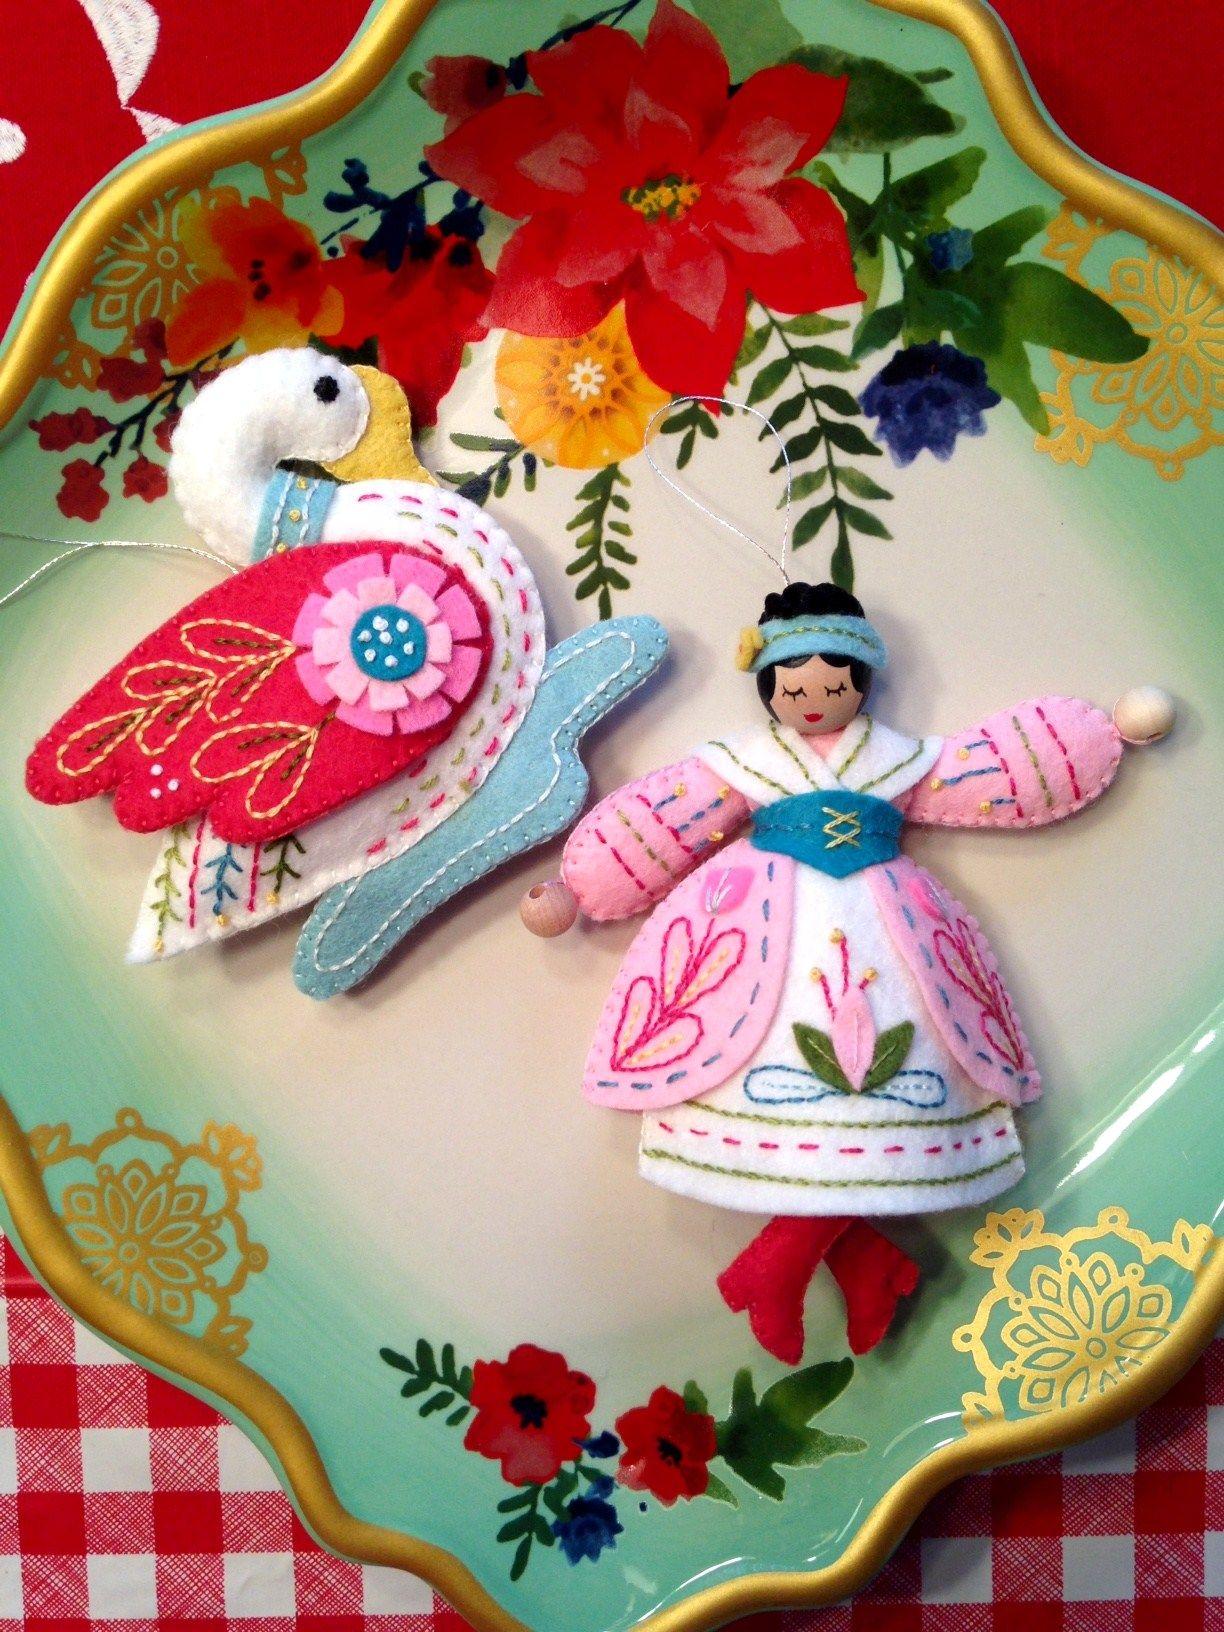 Swan Swimming Lady Dancing Pattern Mmmcrafts Felt Christmas Ornaments Felt Christmas Decorations Handmade Felt Ornament